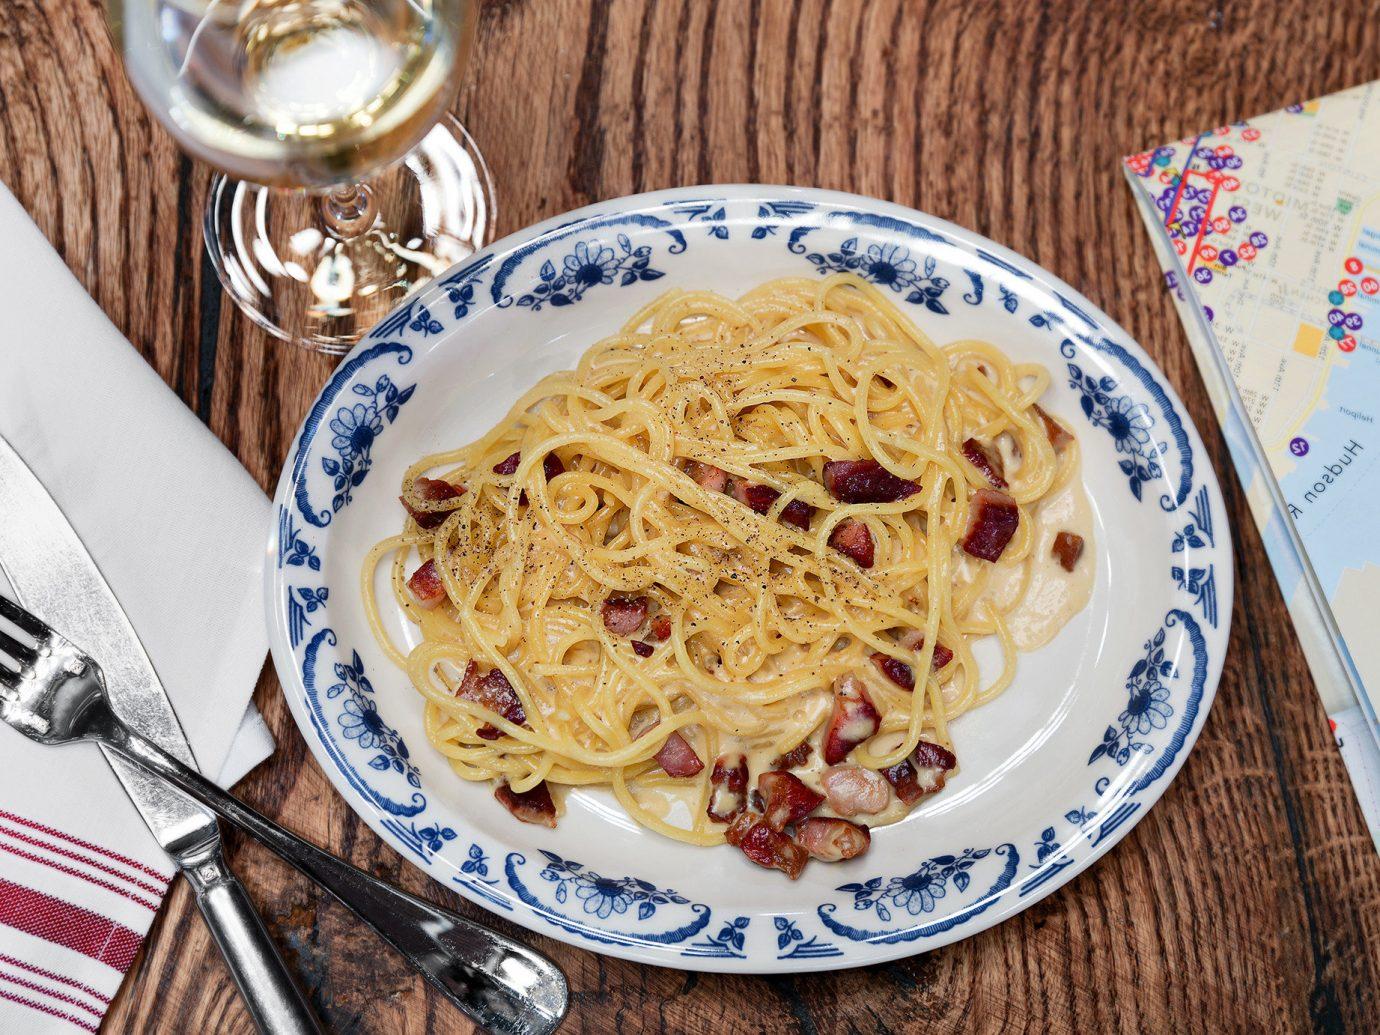 Budget plate table food cup coffee spaghetti cuisine dish carbonara italian food pici fork bucatini produce european food breakfast meal pasta